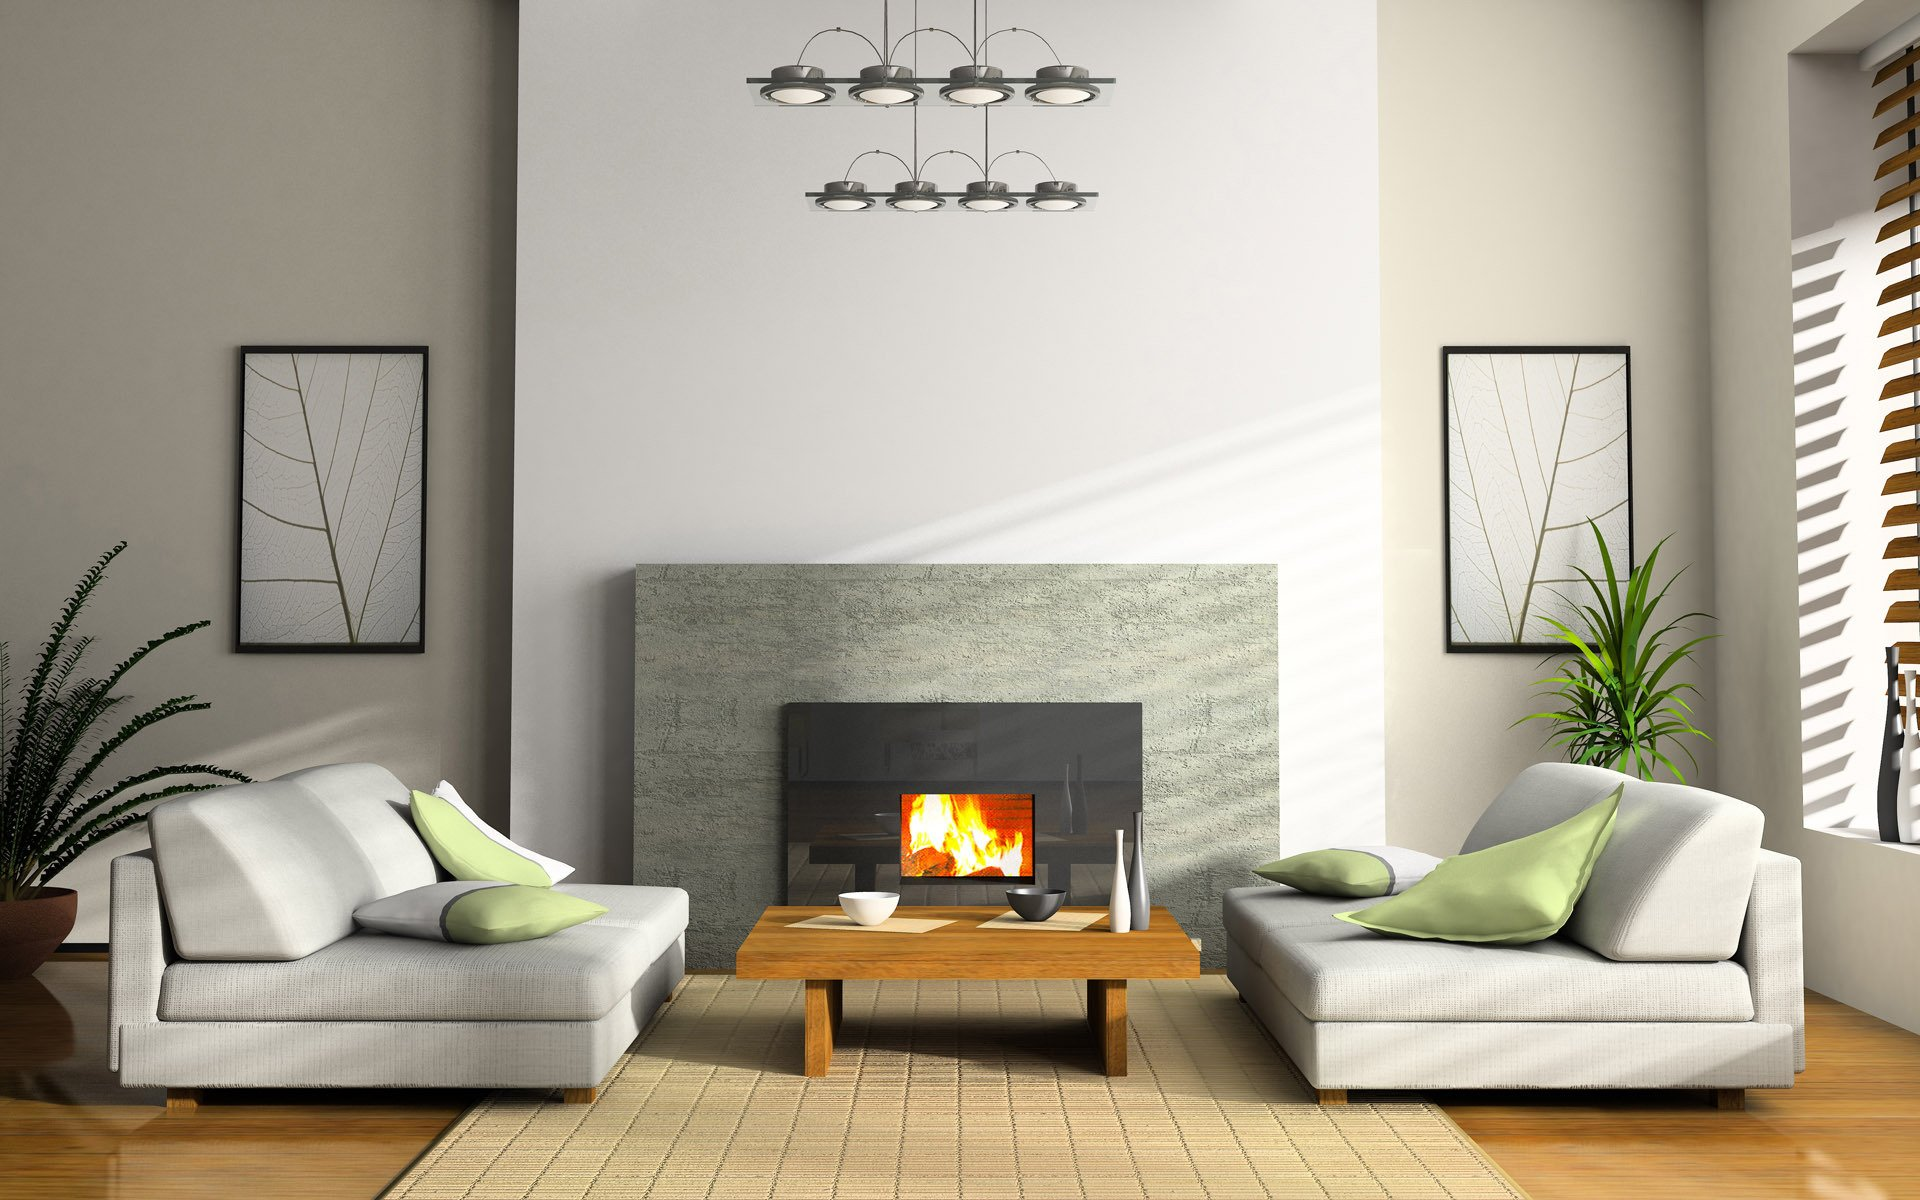 Wanddeko Draußen Neu Interior Room Apartment Design Style sofa Chair Fire Firepla